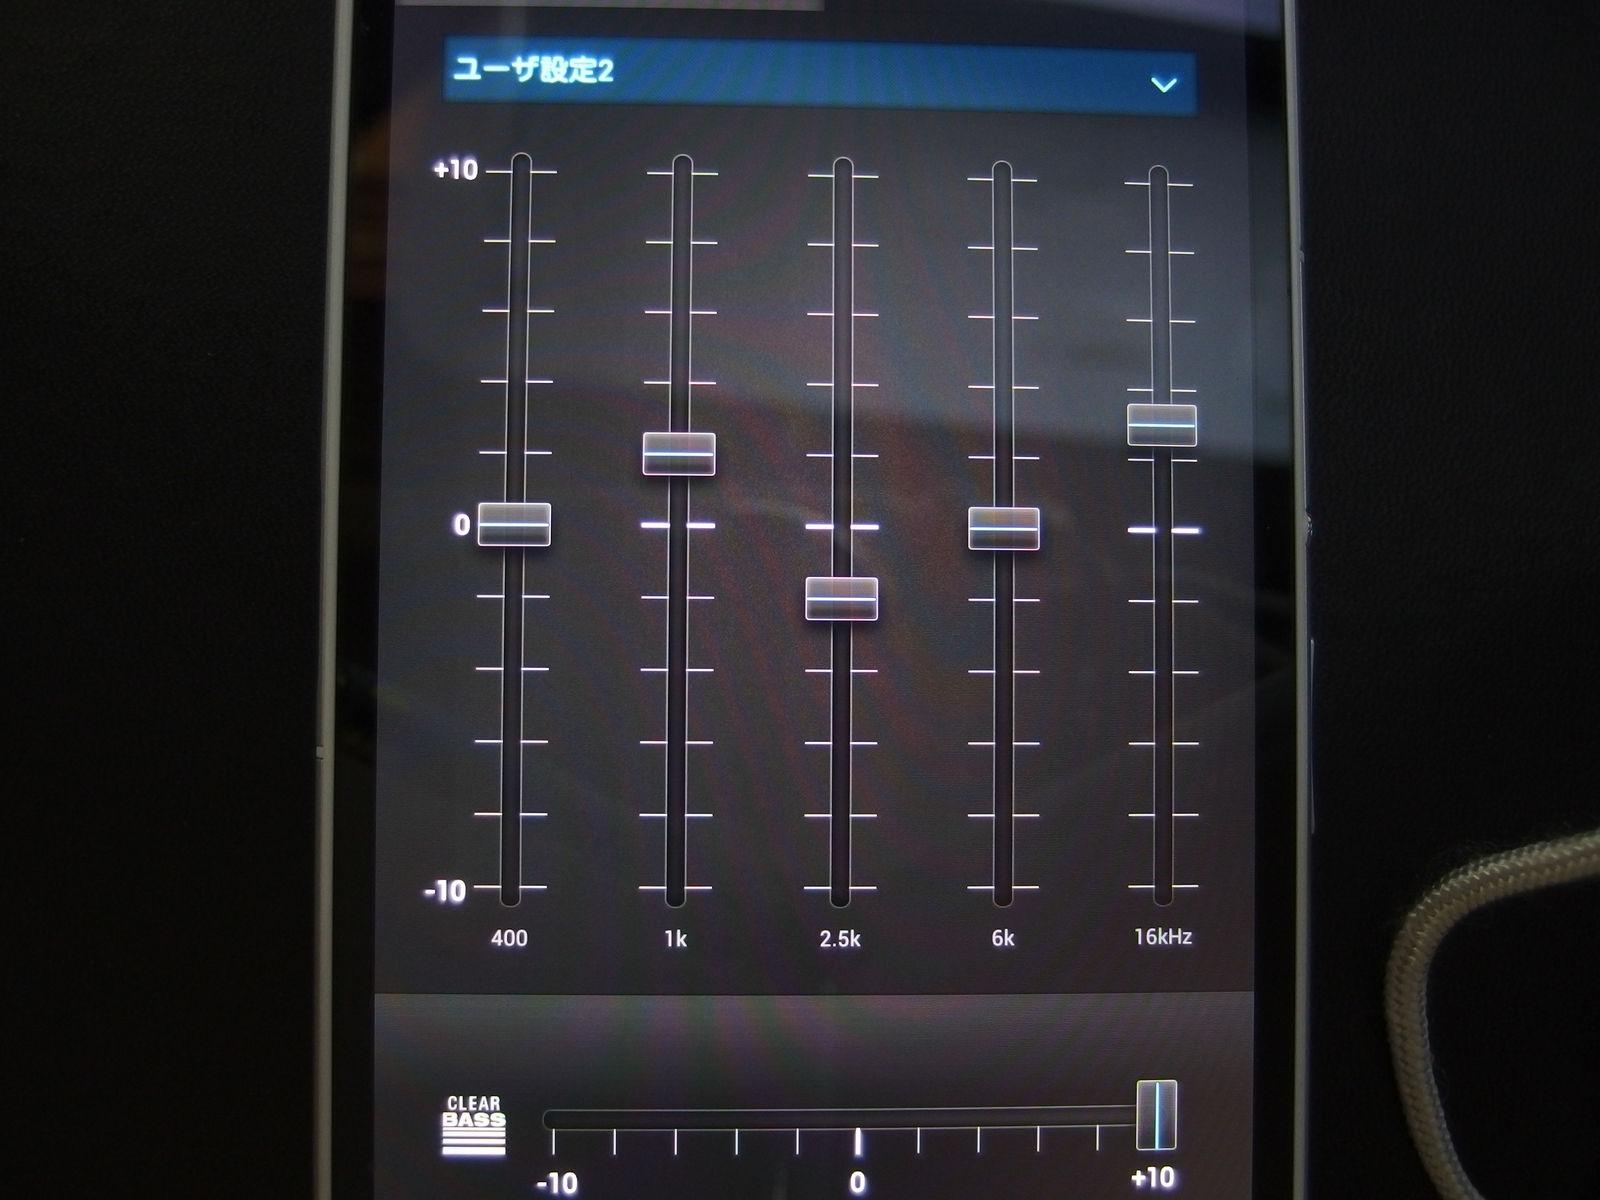 Sonyから発売されている Nw M505 の使用感 デジタル家電が中心